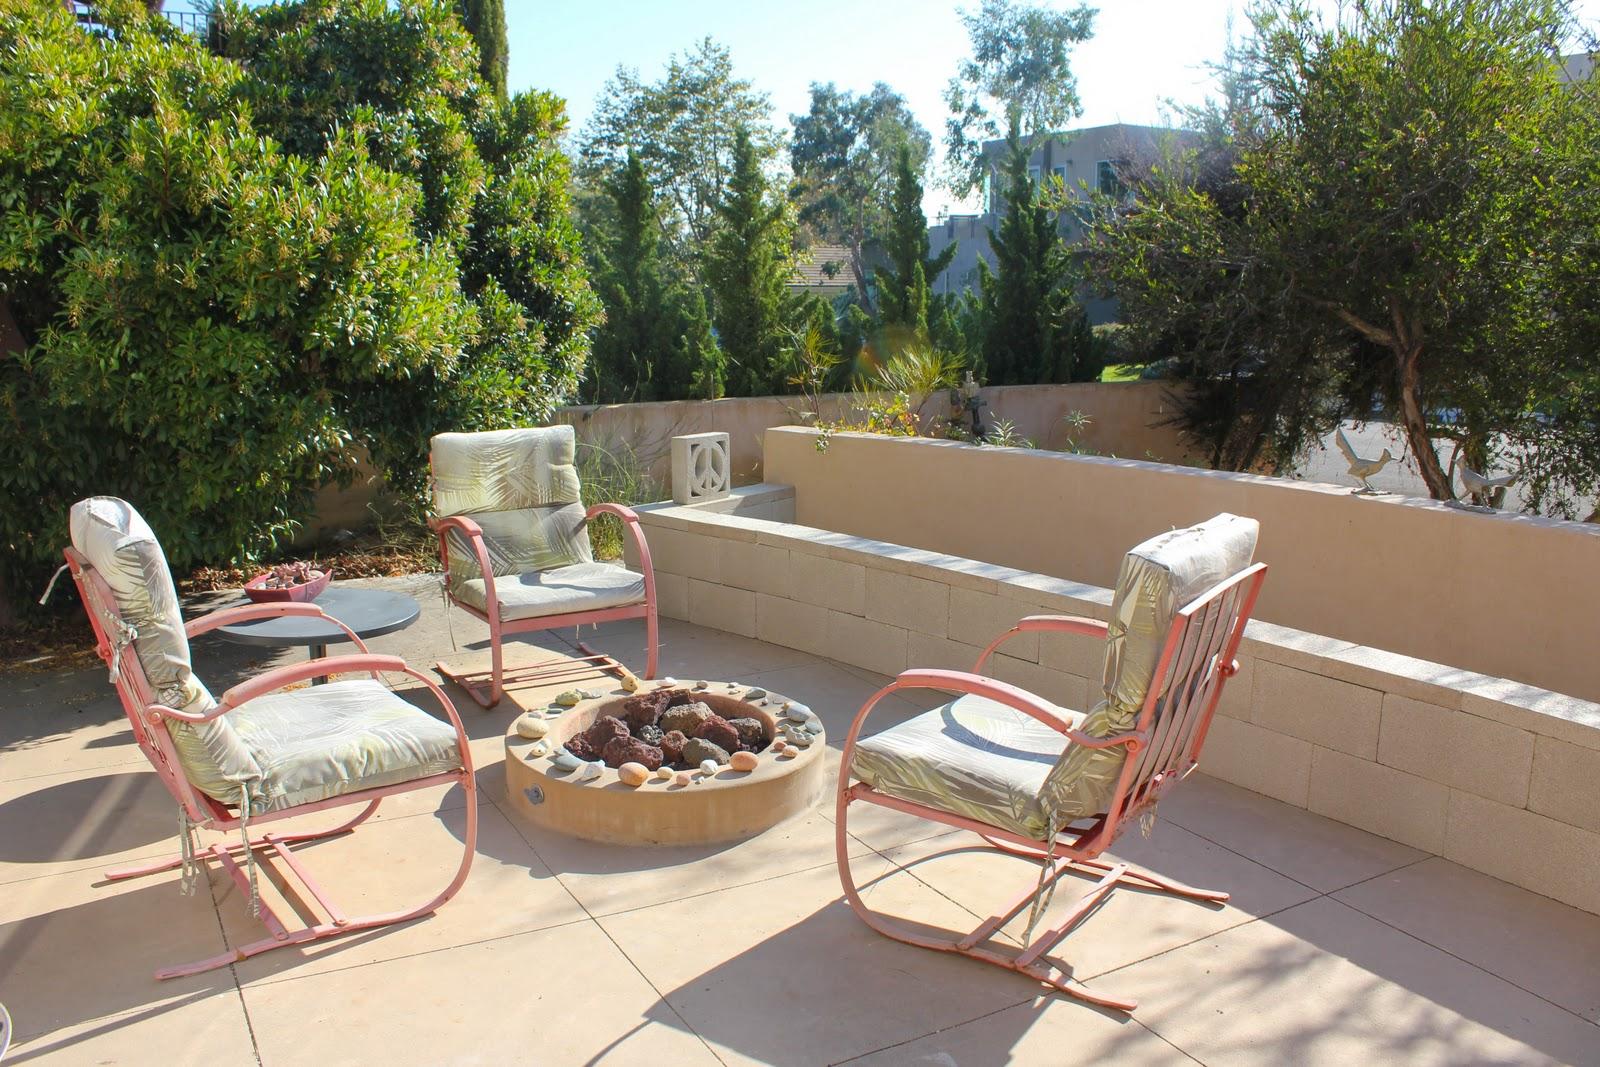 concrete block furniture ideas. DIY Concrete Vegetable Garden Block Furniture Ideas